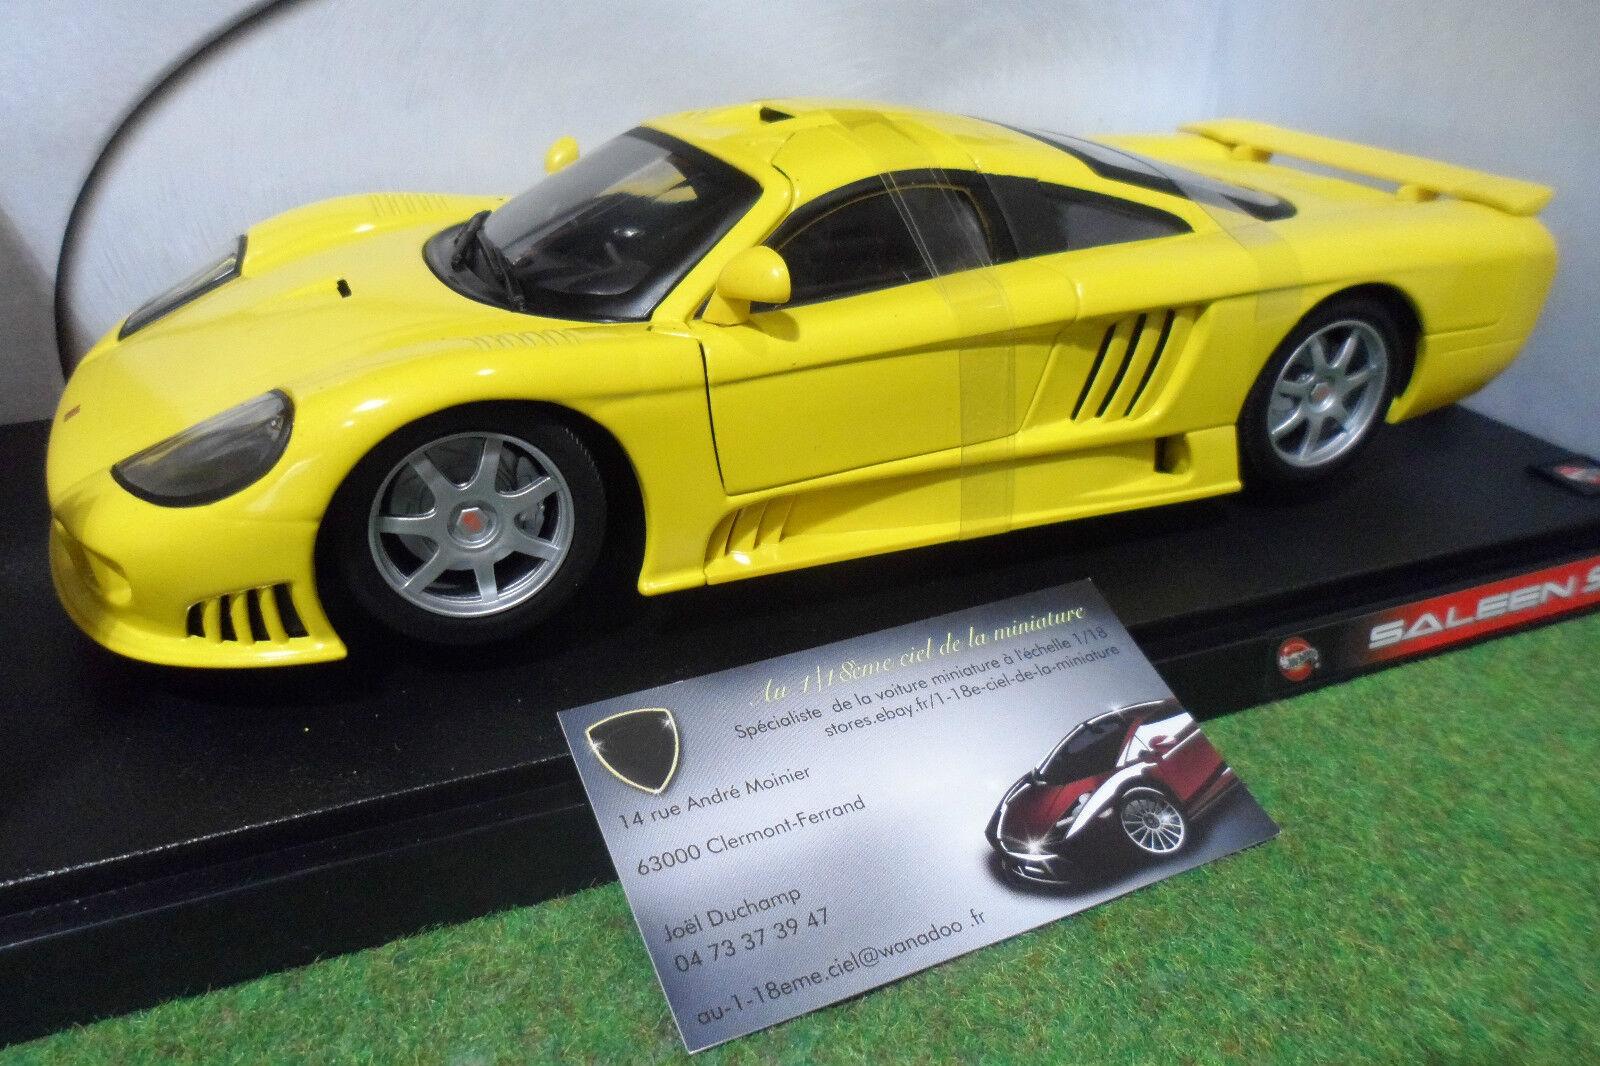 SALEEN S7 Jaune à l'échelle 1 18 HOT WHEELS 57302 voiture miniature